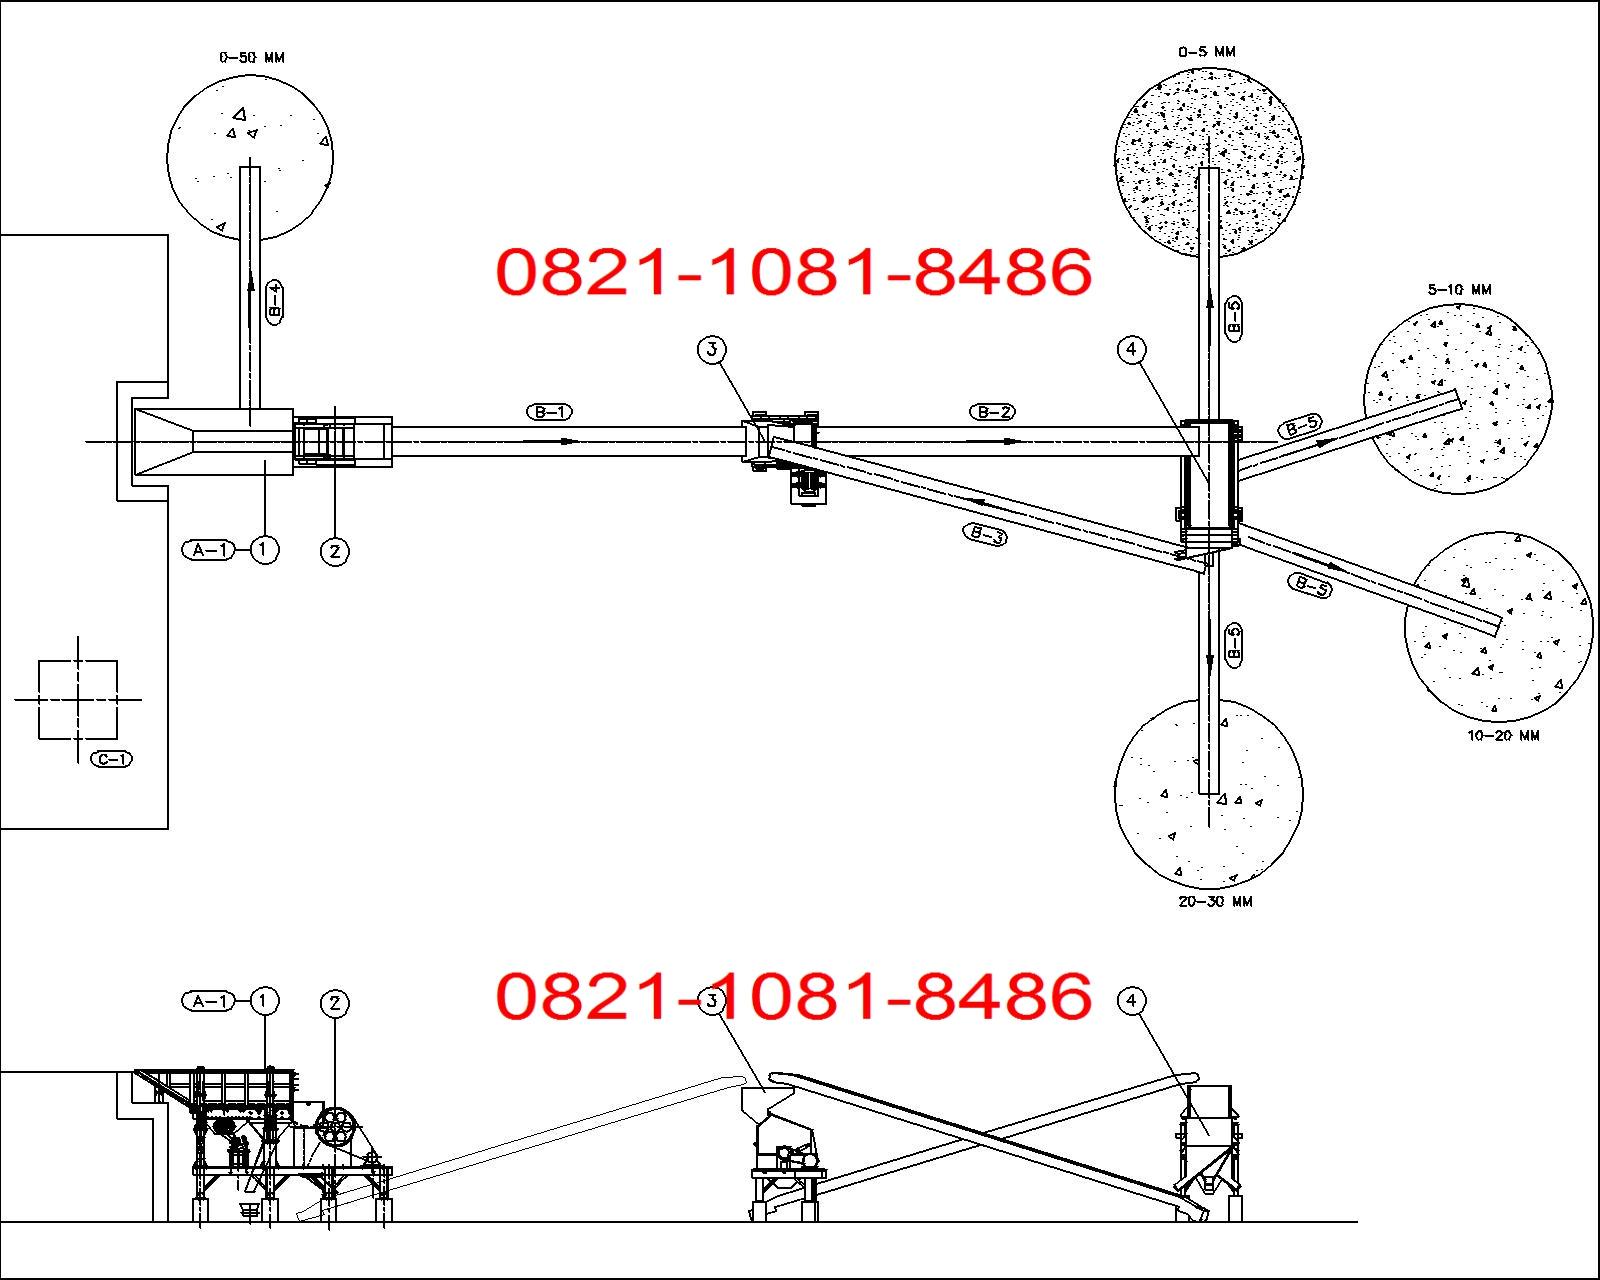 Jual Stone Crusher Plant 80 100 Tph Sand Making Wiring Diagram Daihatsu Taft Rocky Flow Lay Out